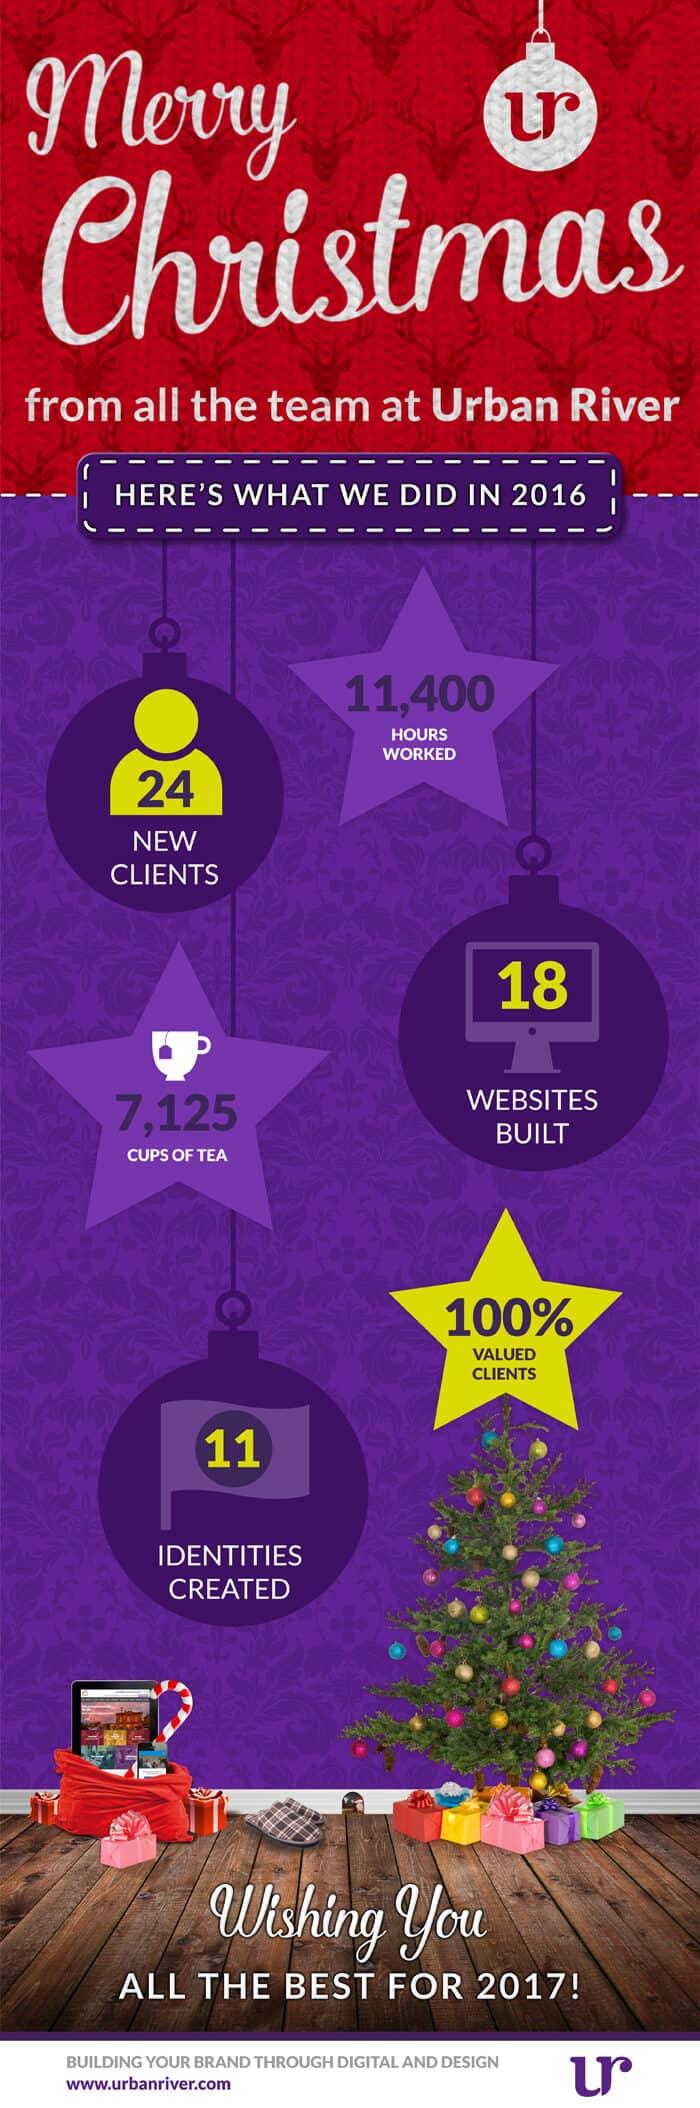 Urban River Christmas Infographic